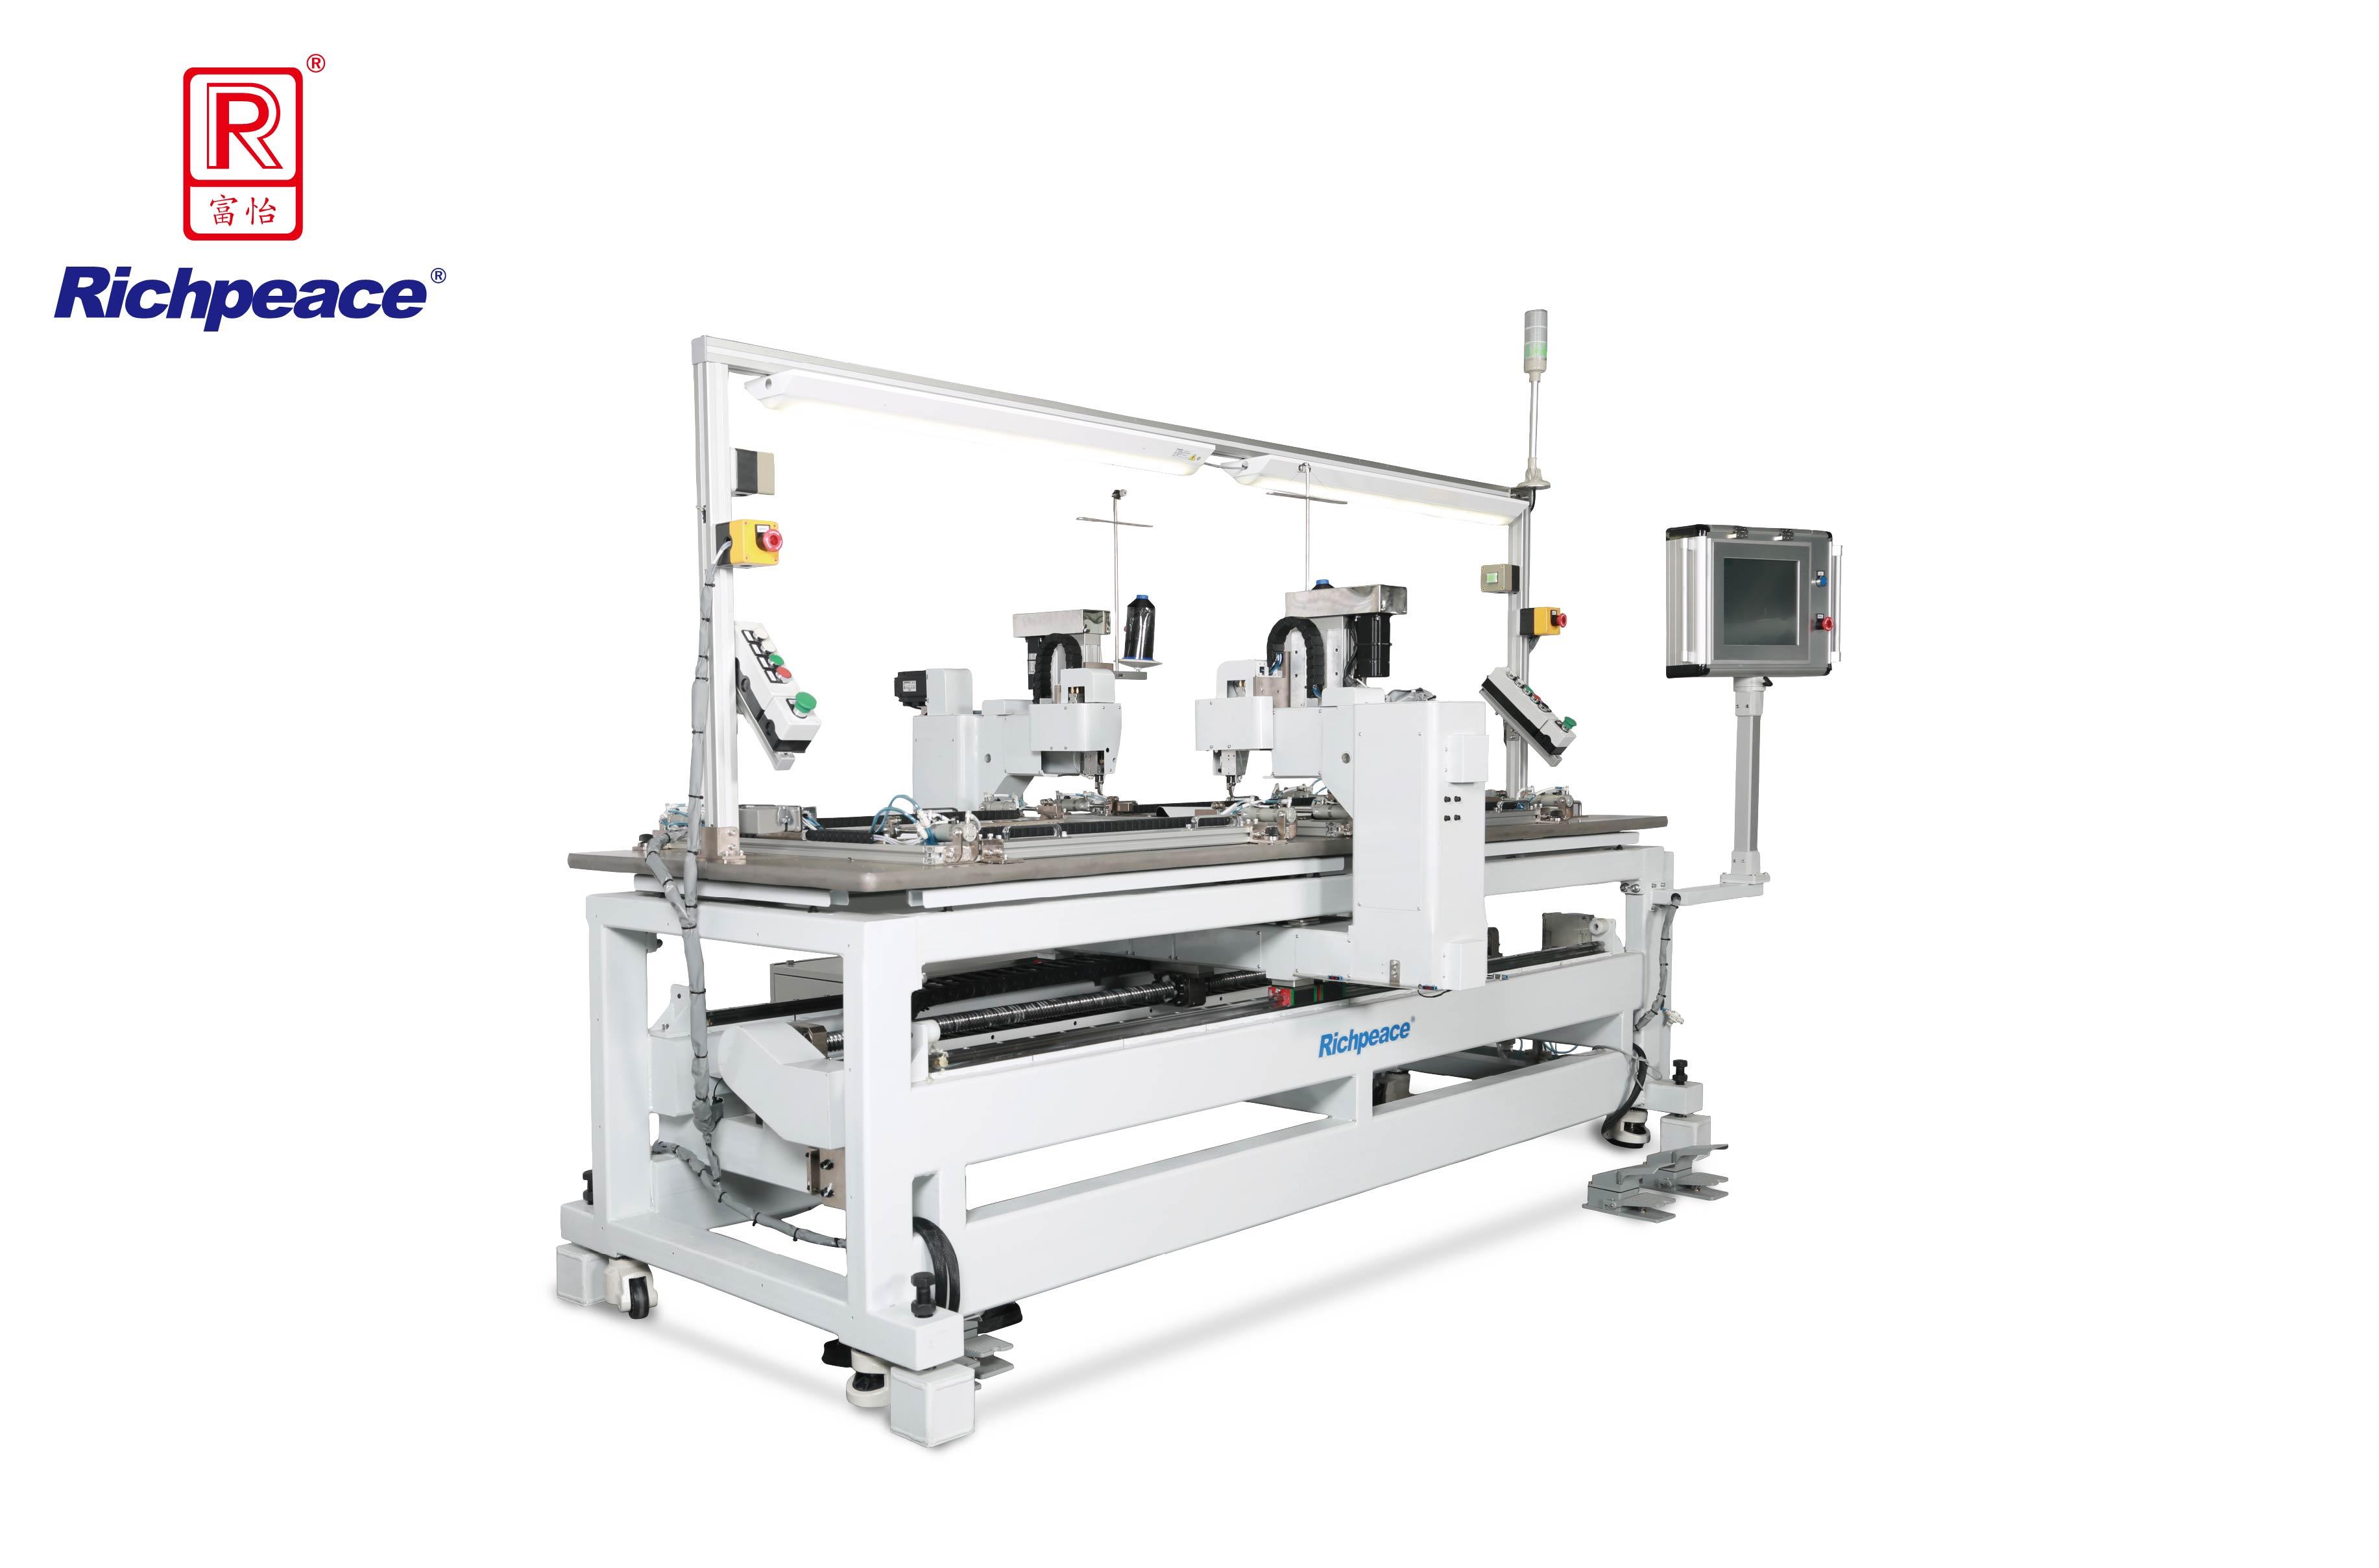 Richpeace Automatic Two-Station Sewing Machine